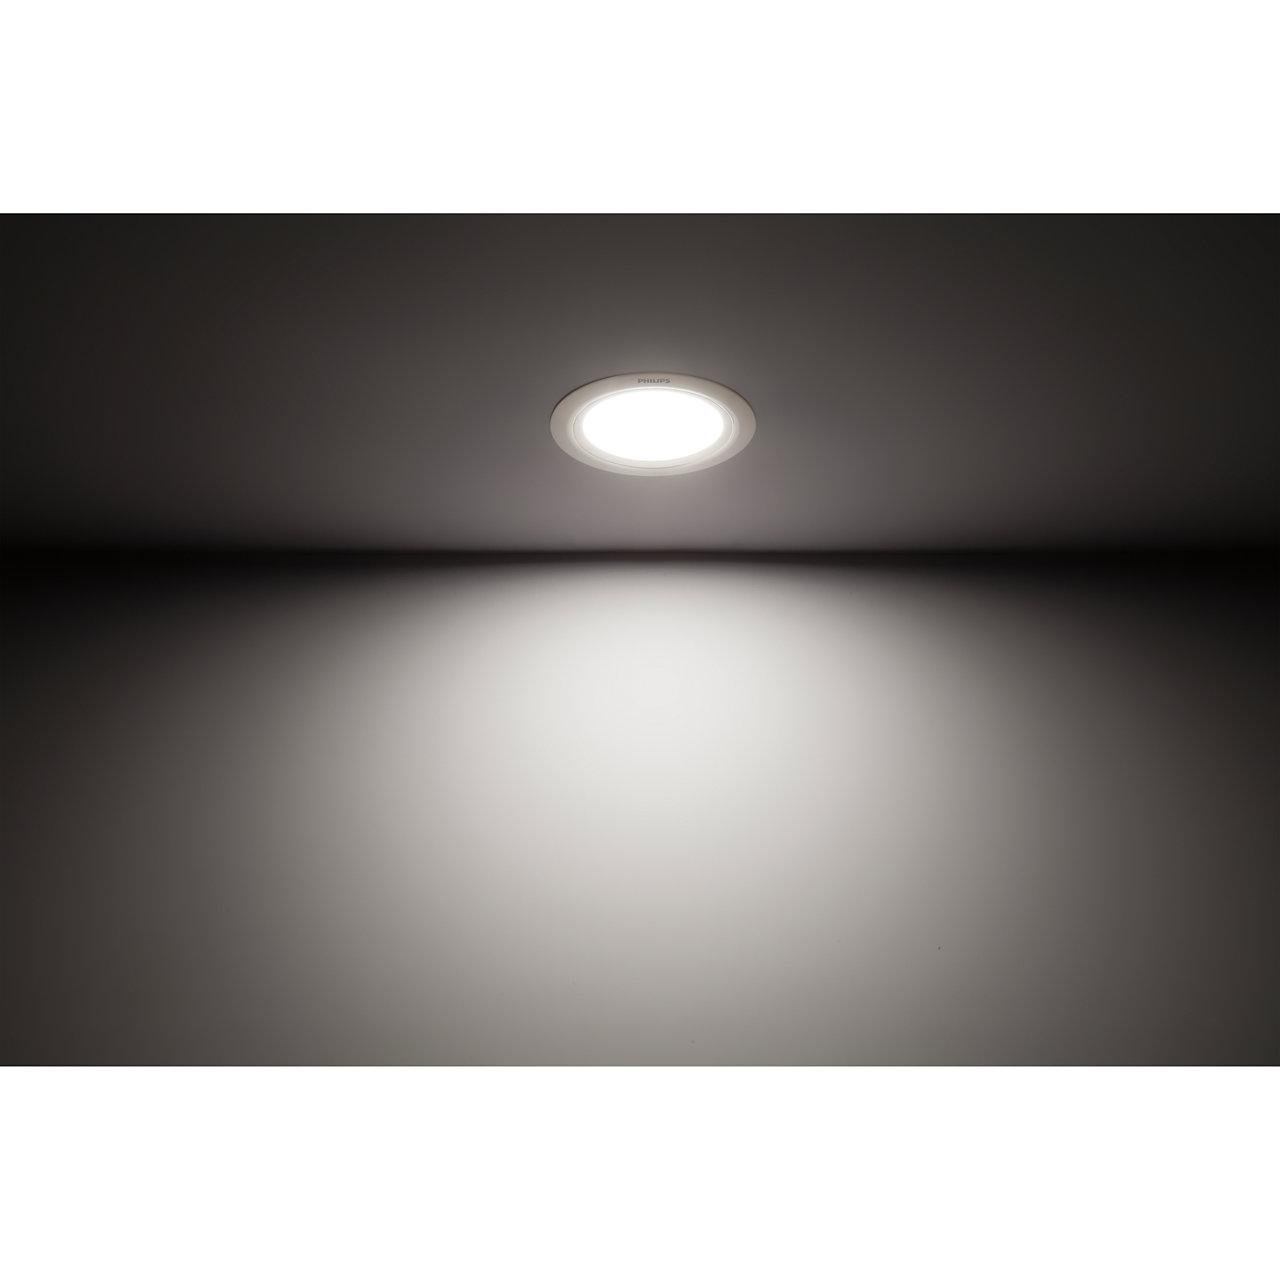 Philips Hue White Ambiance Downlight - โคมไฟดาวน์ไลท์อัจฉริยะ